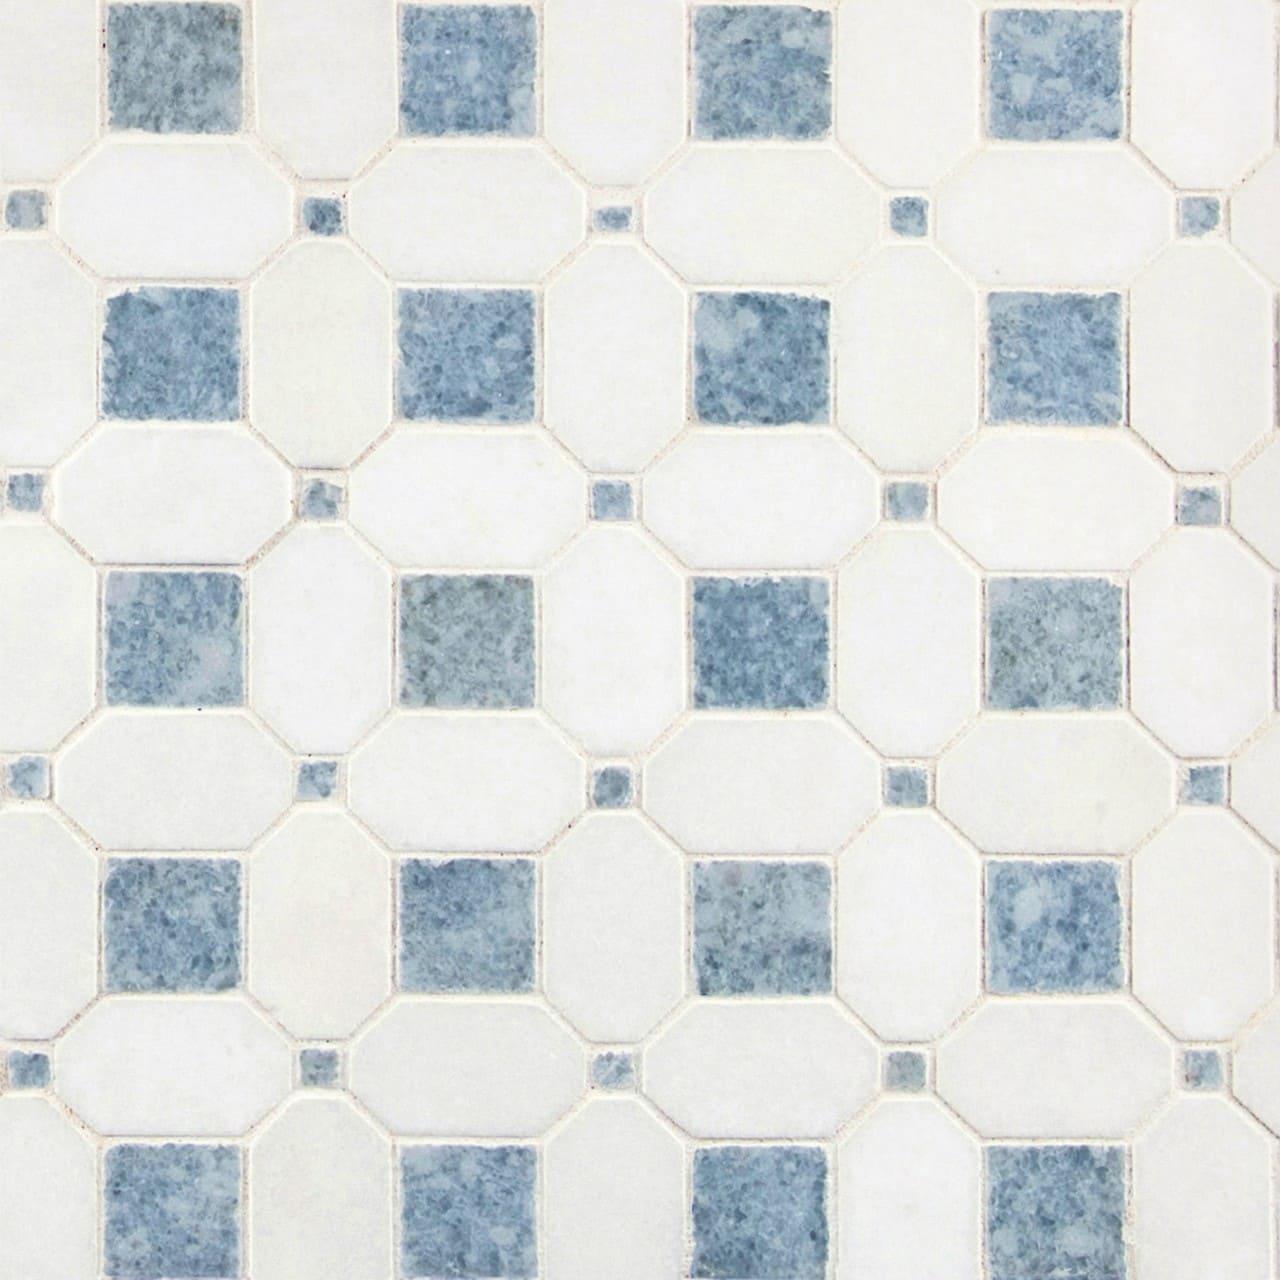 Azula Hatchwork Backsplash Wall Tile